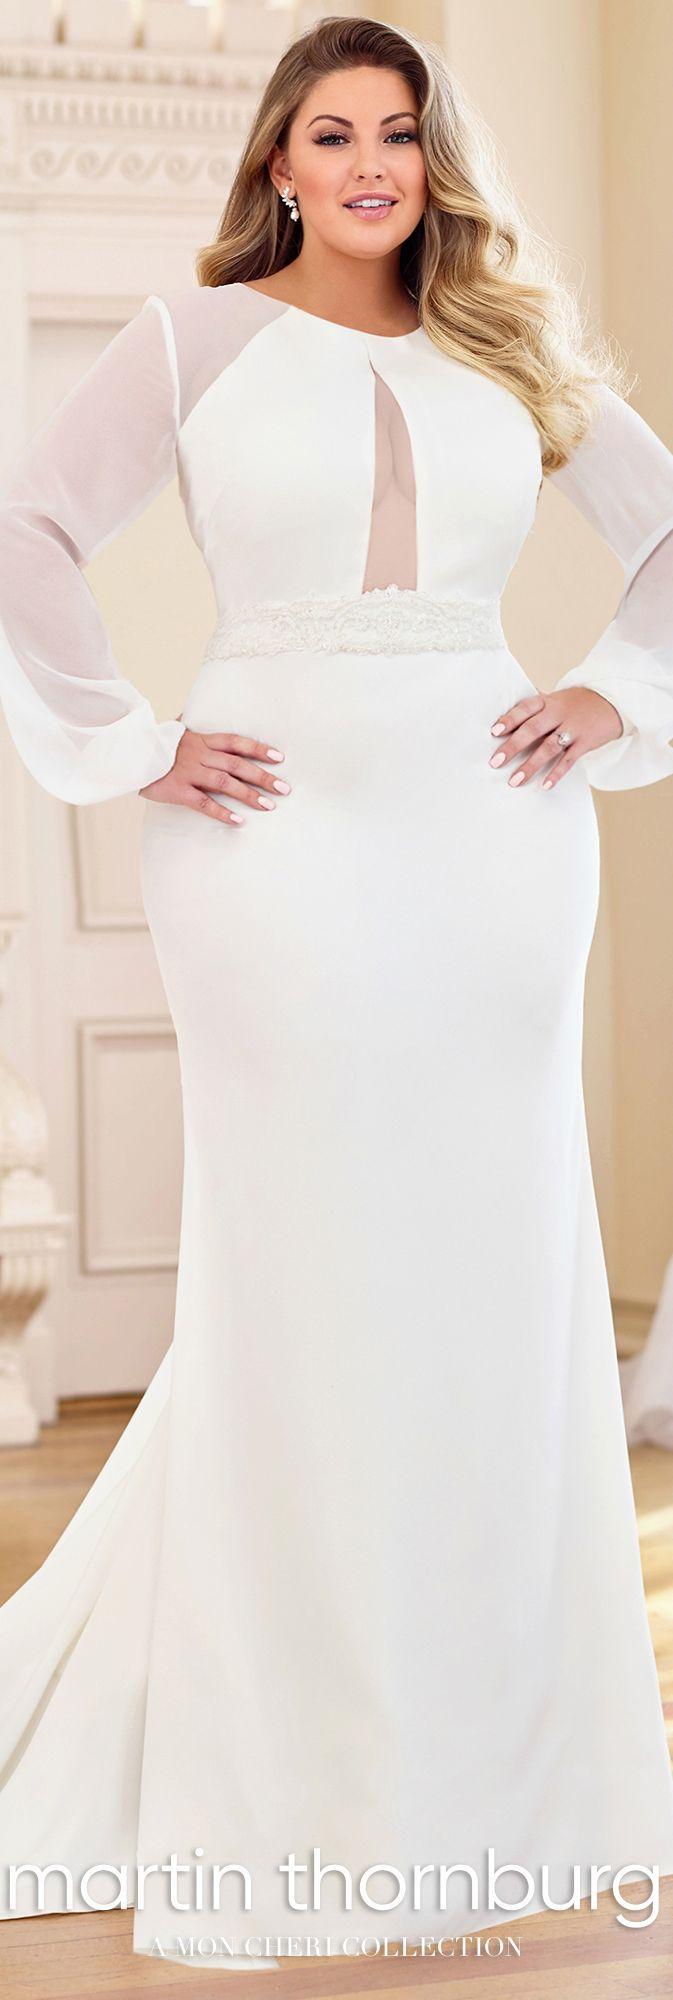 Plus size wedding dresses burlington nc, Adrianna papell plus size ...